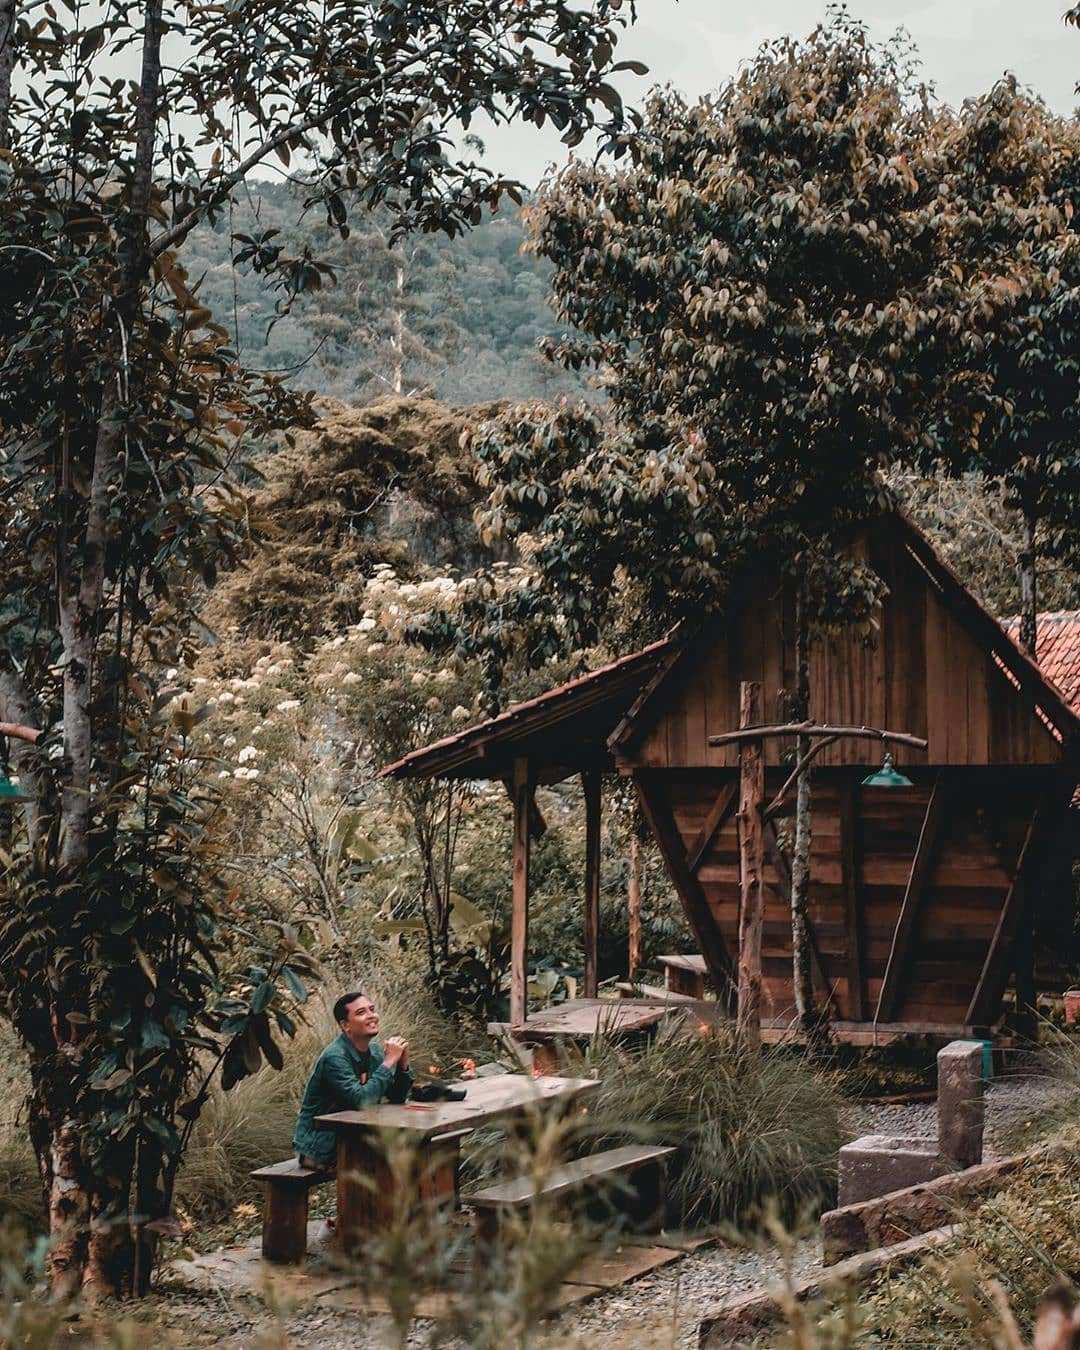 Warung Kopi Gunung Ciwidey Yang Dikelilingi Pepohonan Image From @_novanr